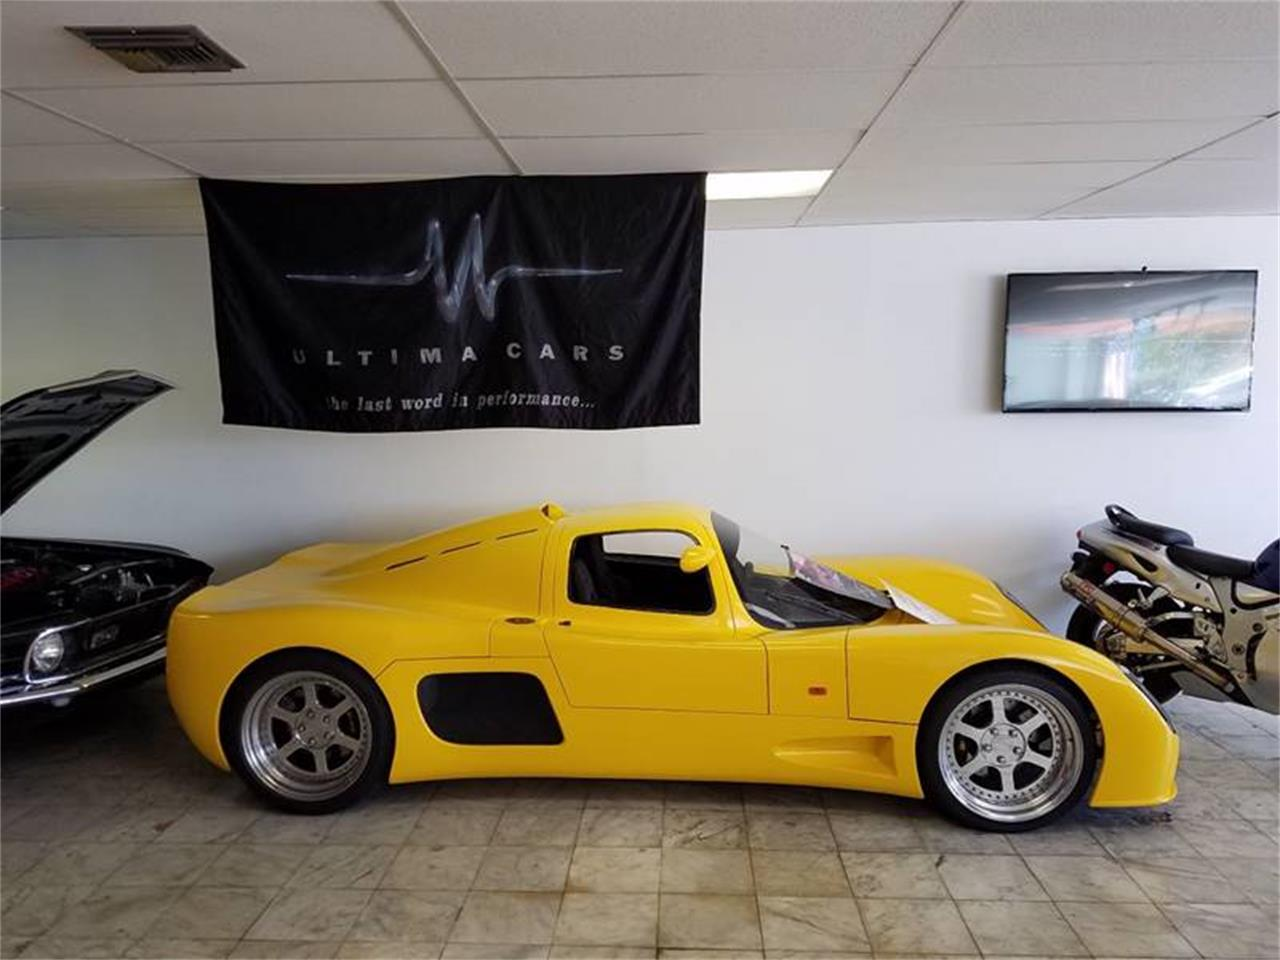 2000 Ultima GTR for Sale   ClassicCars.com   CC-1027266